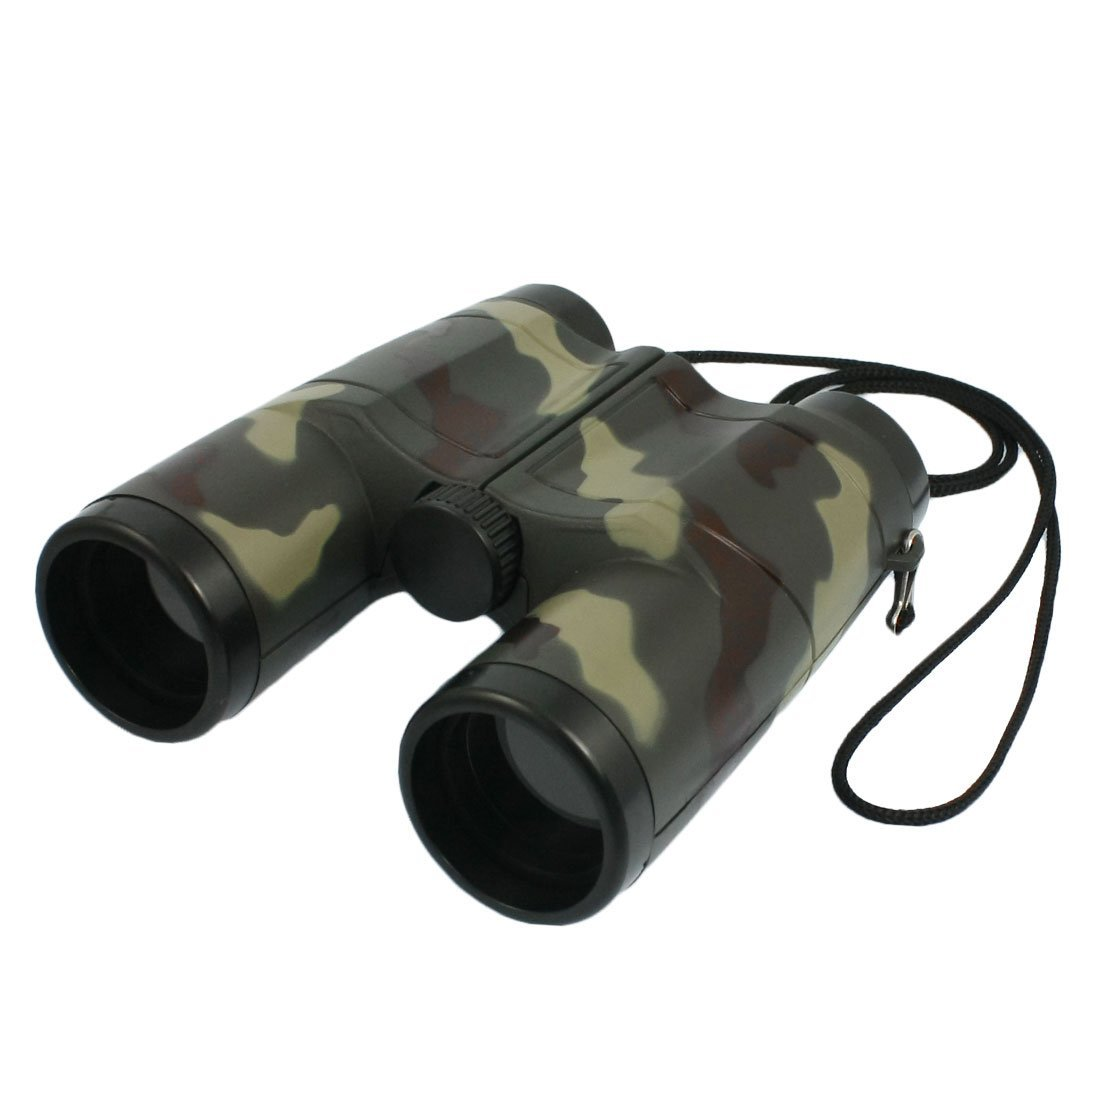 SODIAL(R) 4X 31mm Lens Camouflage Pattern Binocular Telescope For Child + Neck Strap